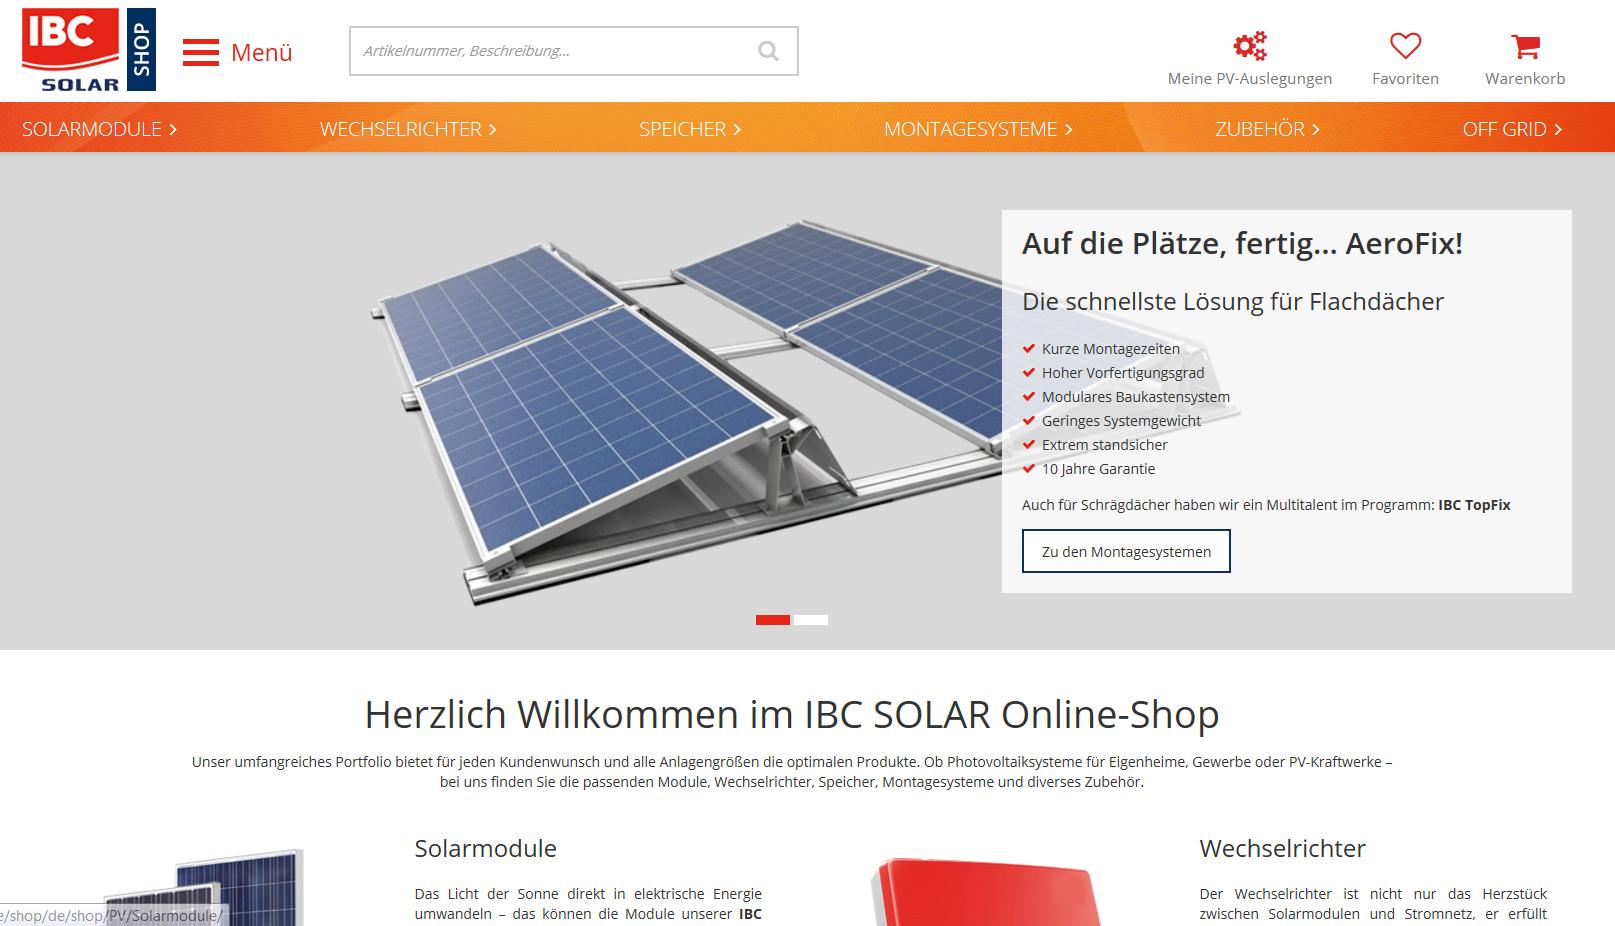 relaunch f r ibc solar online shop dachbaumagazin. Black Bedroom Furniture Sets. Home Design Ideas